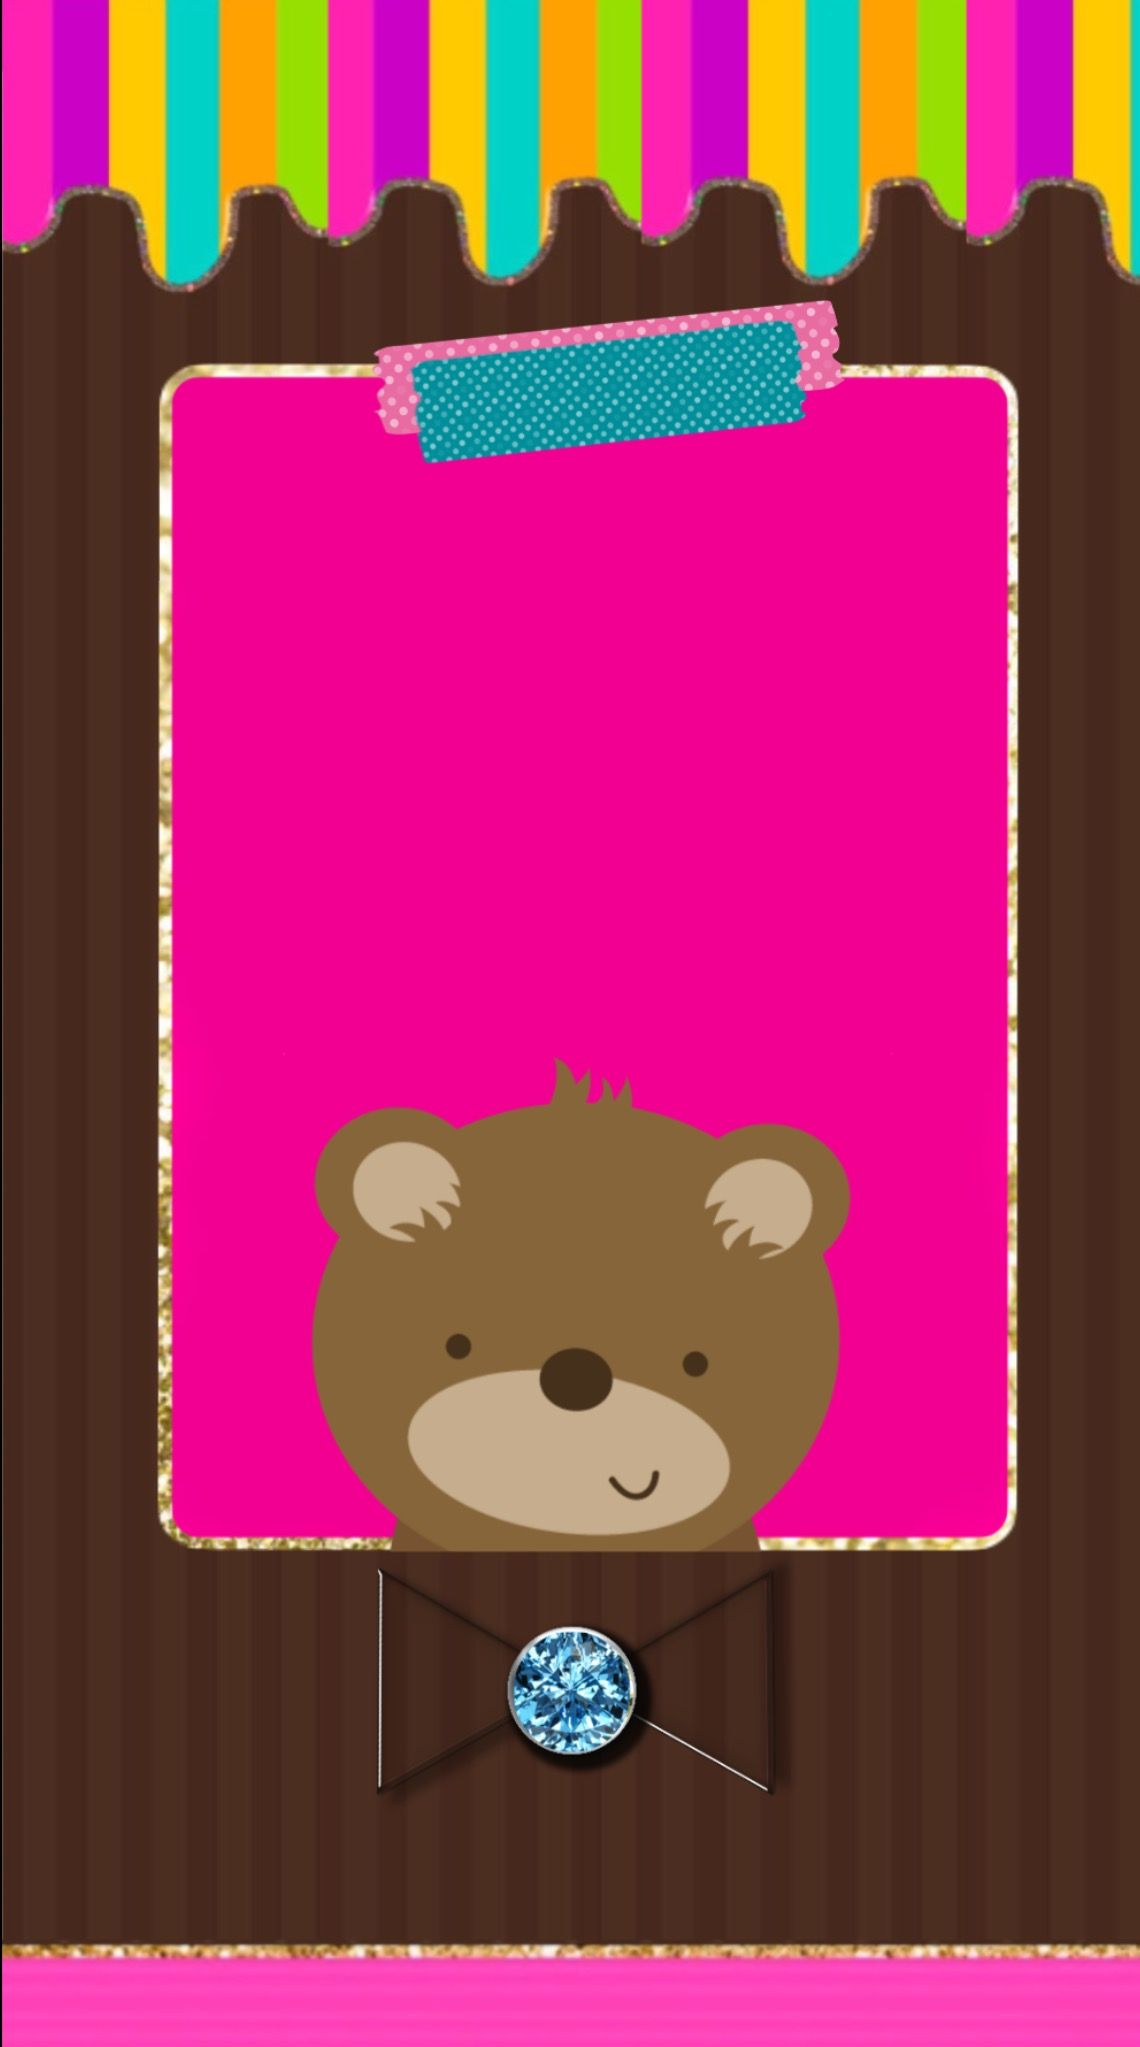 Fantastic Wallpaper Hello Kitty Frame  A0Bbf9Bd19F0A01B3Da1A33Fe1B05663 You Should Have 637424